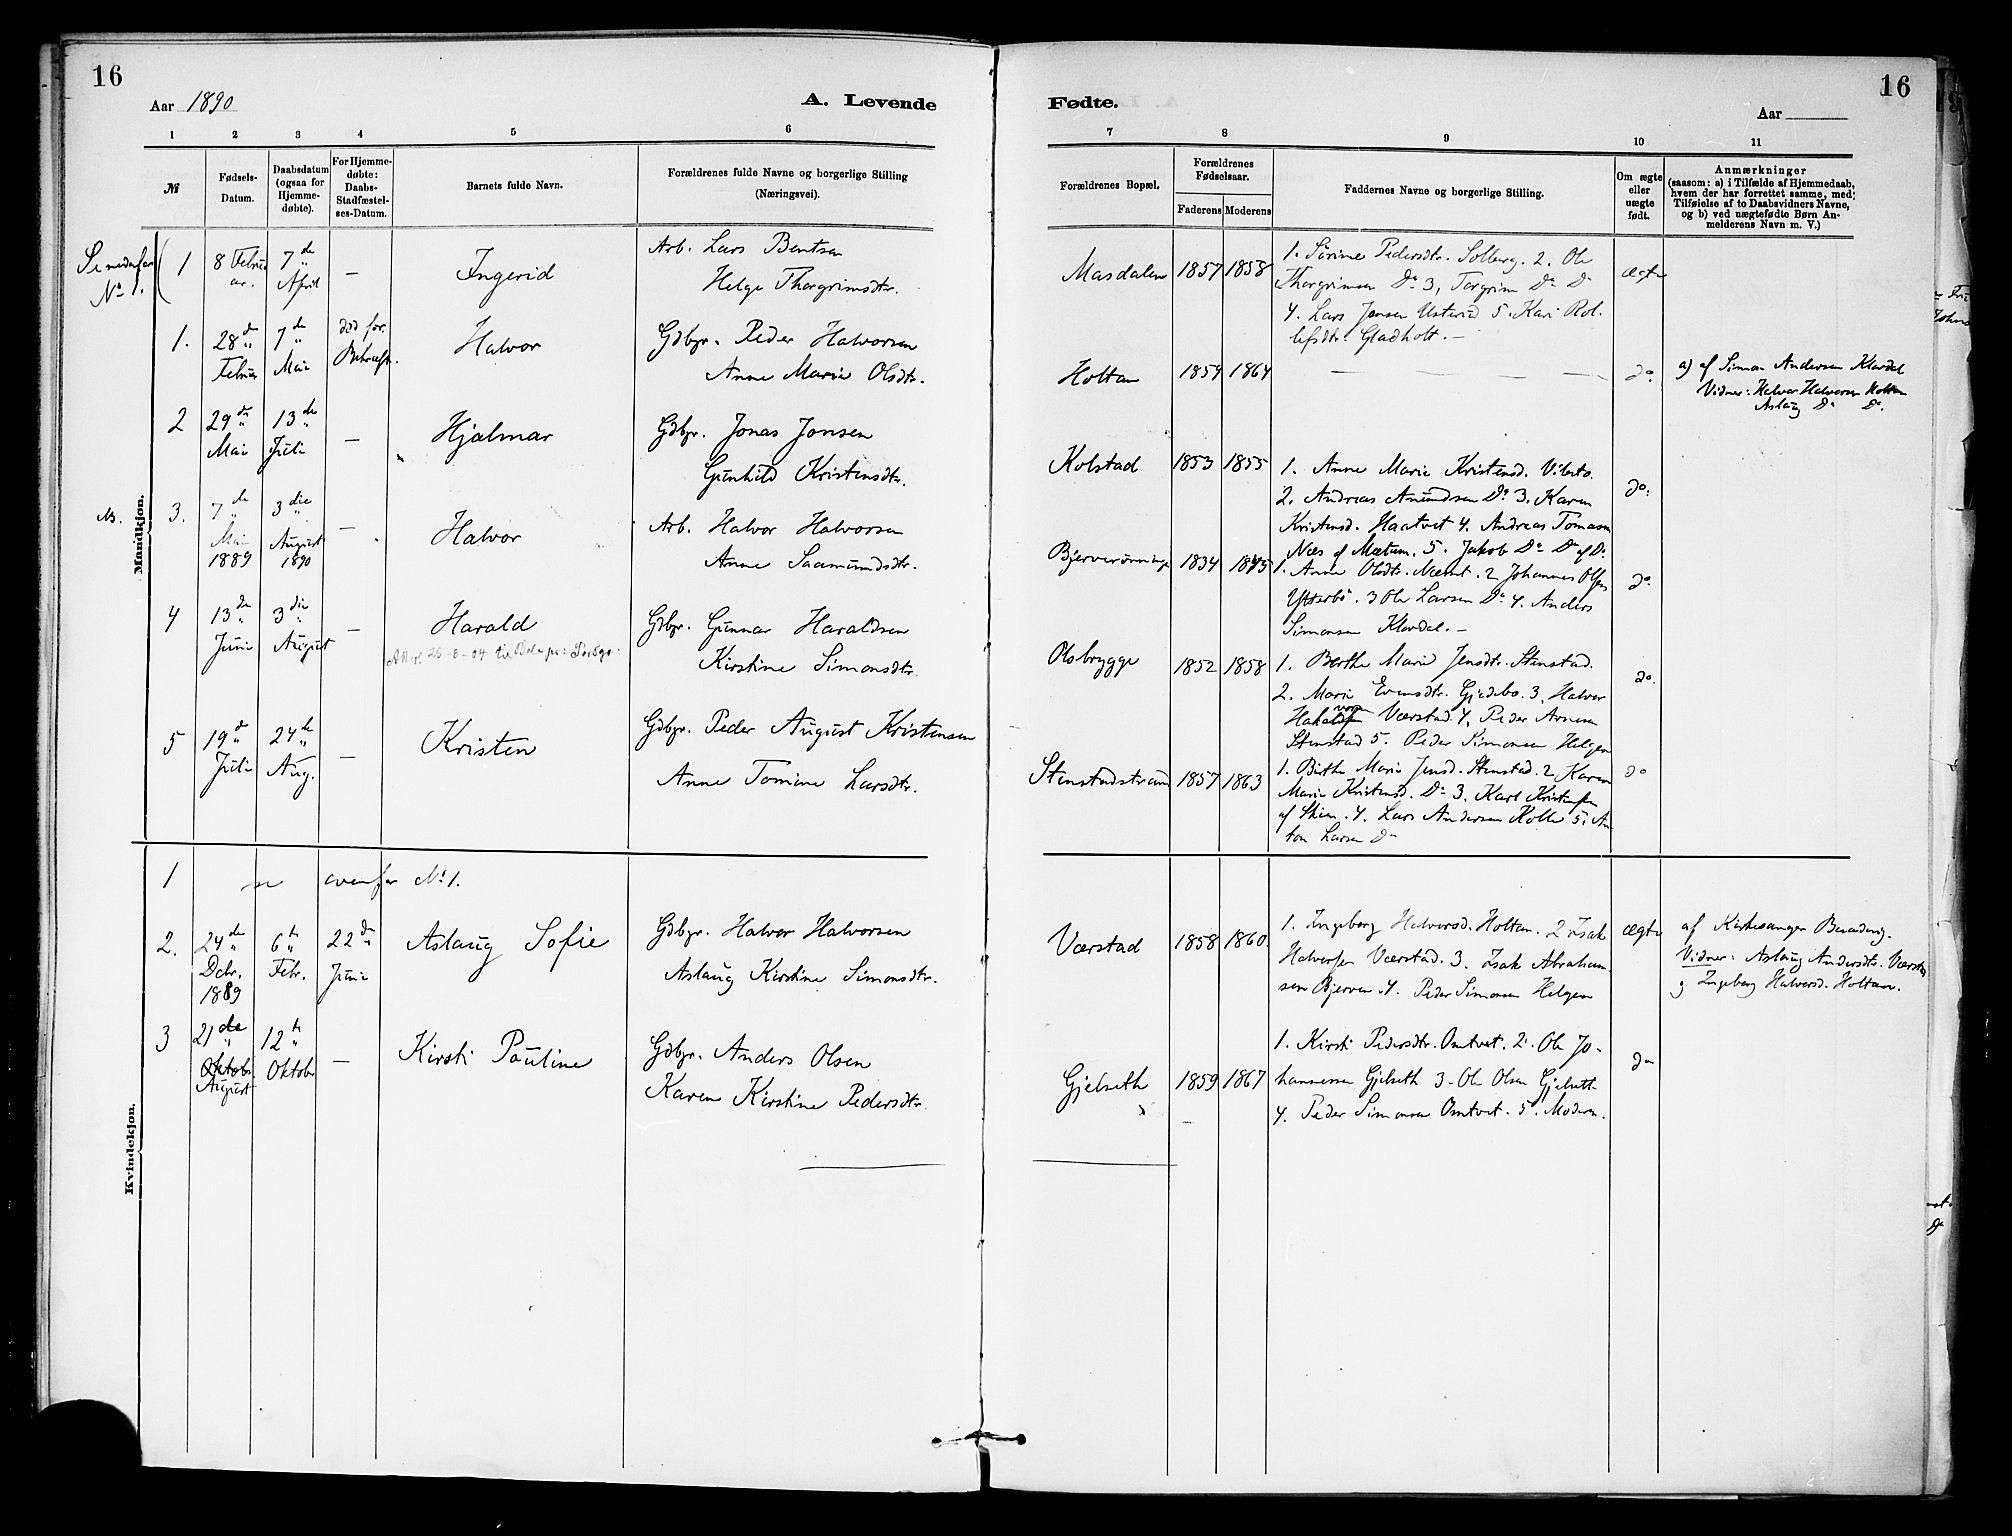 SAKO, Holla kirkebøker, F/Fa/L0009: Ministerialbok nr. 9, 1881-1897, s. 16